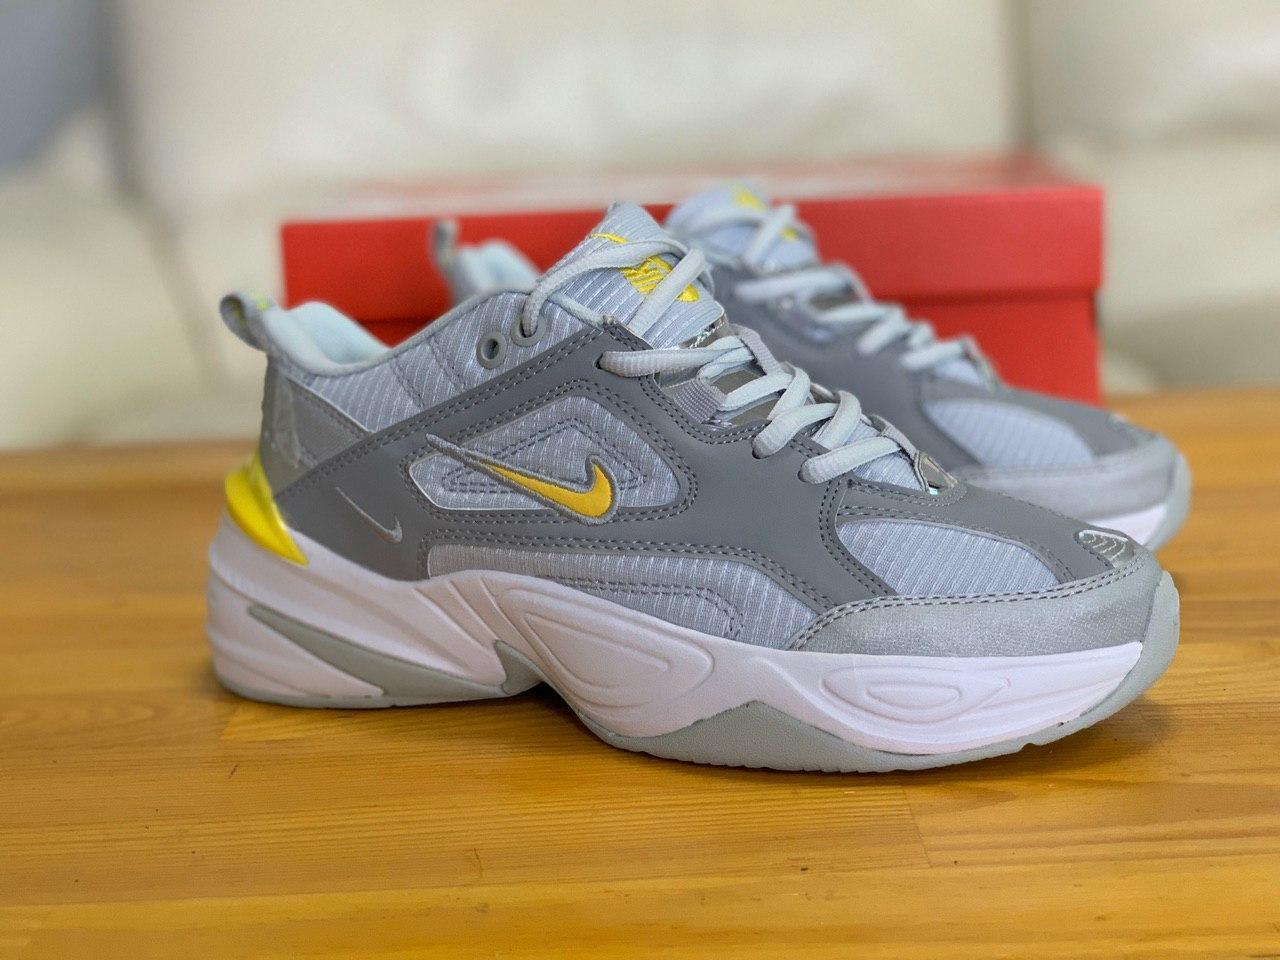 Кроссовки  натуральная кожа Nike M2K Tekno Найк М2К Текно (36,37,38,39,40)